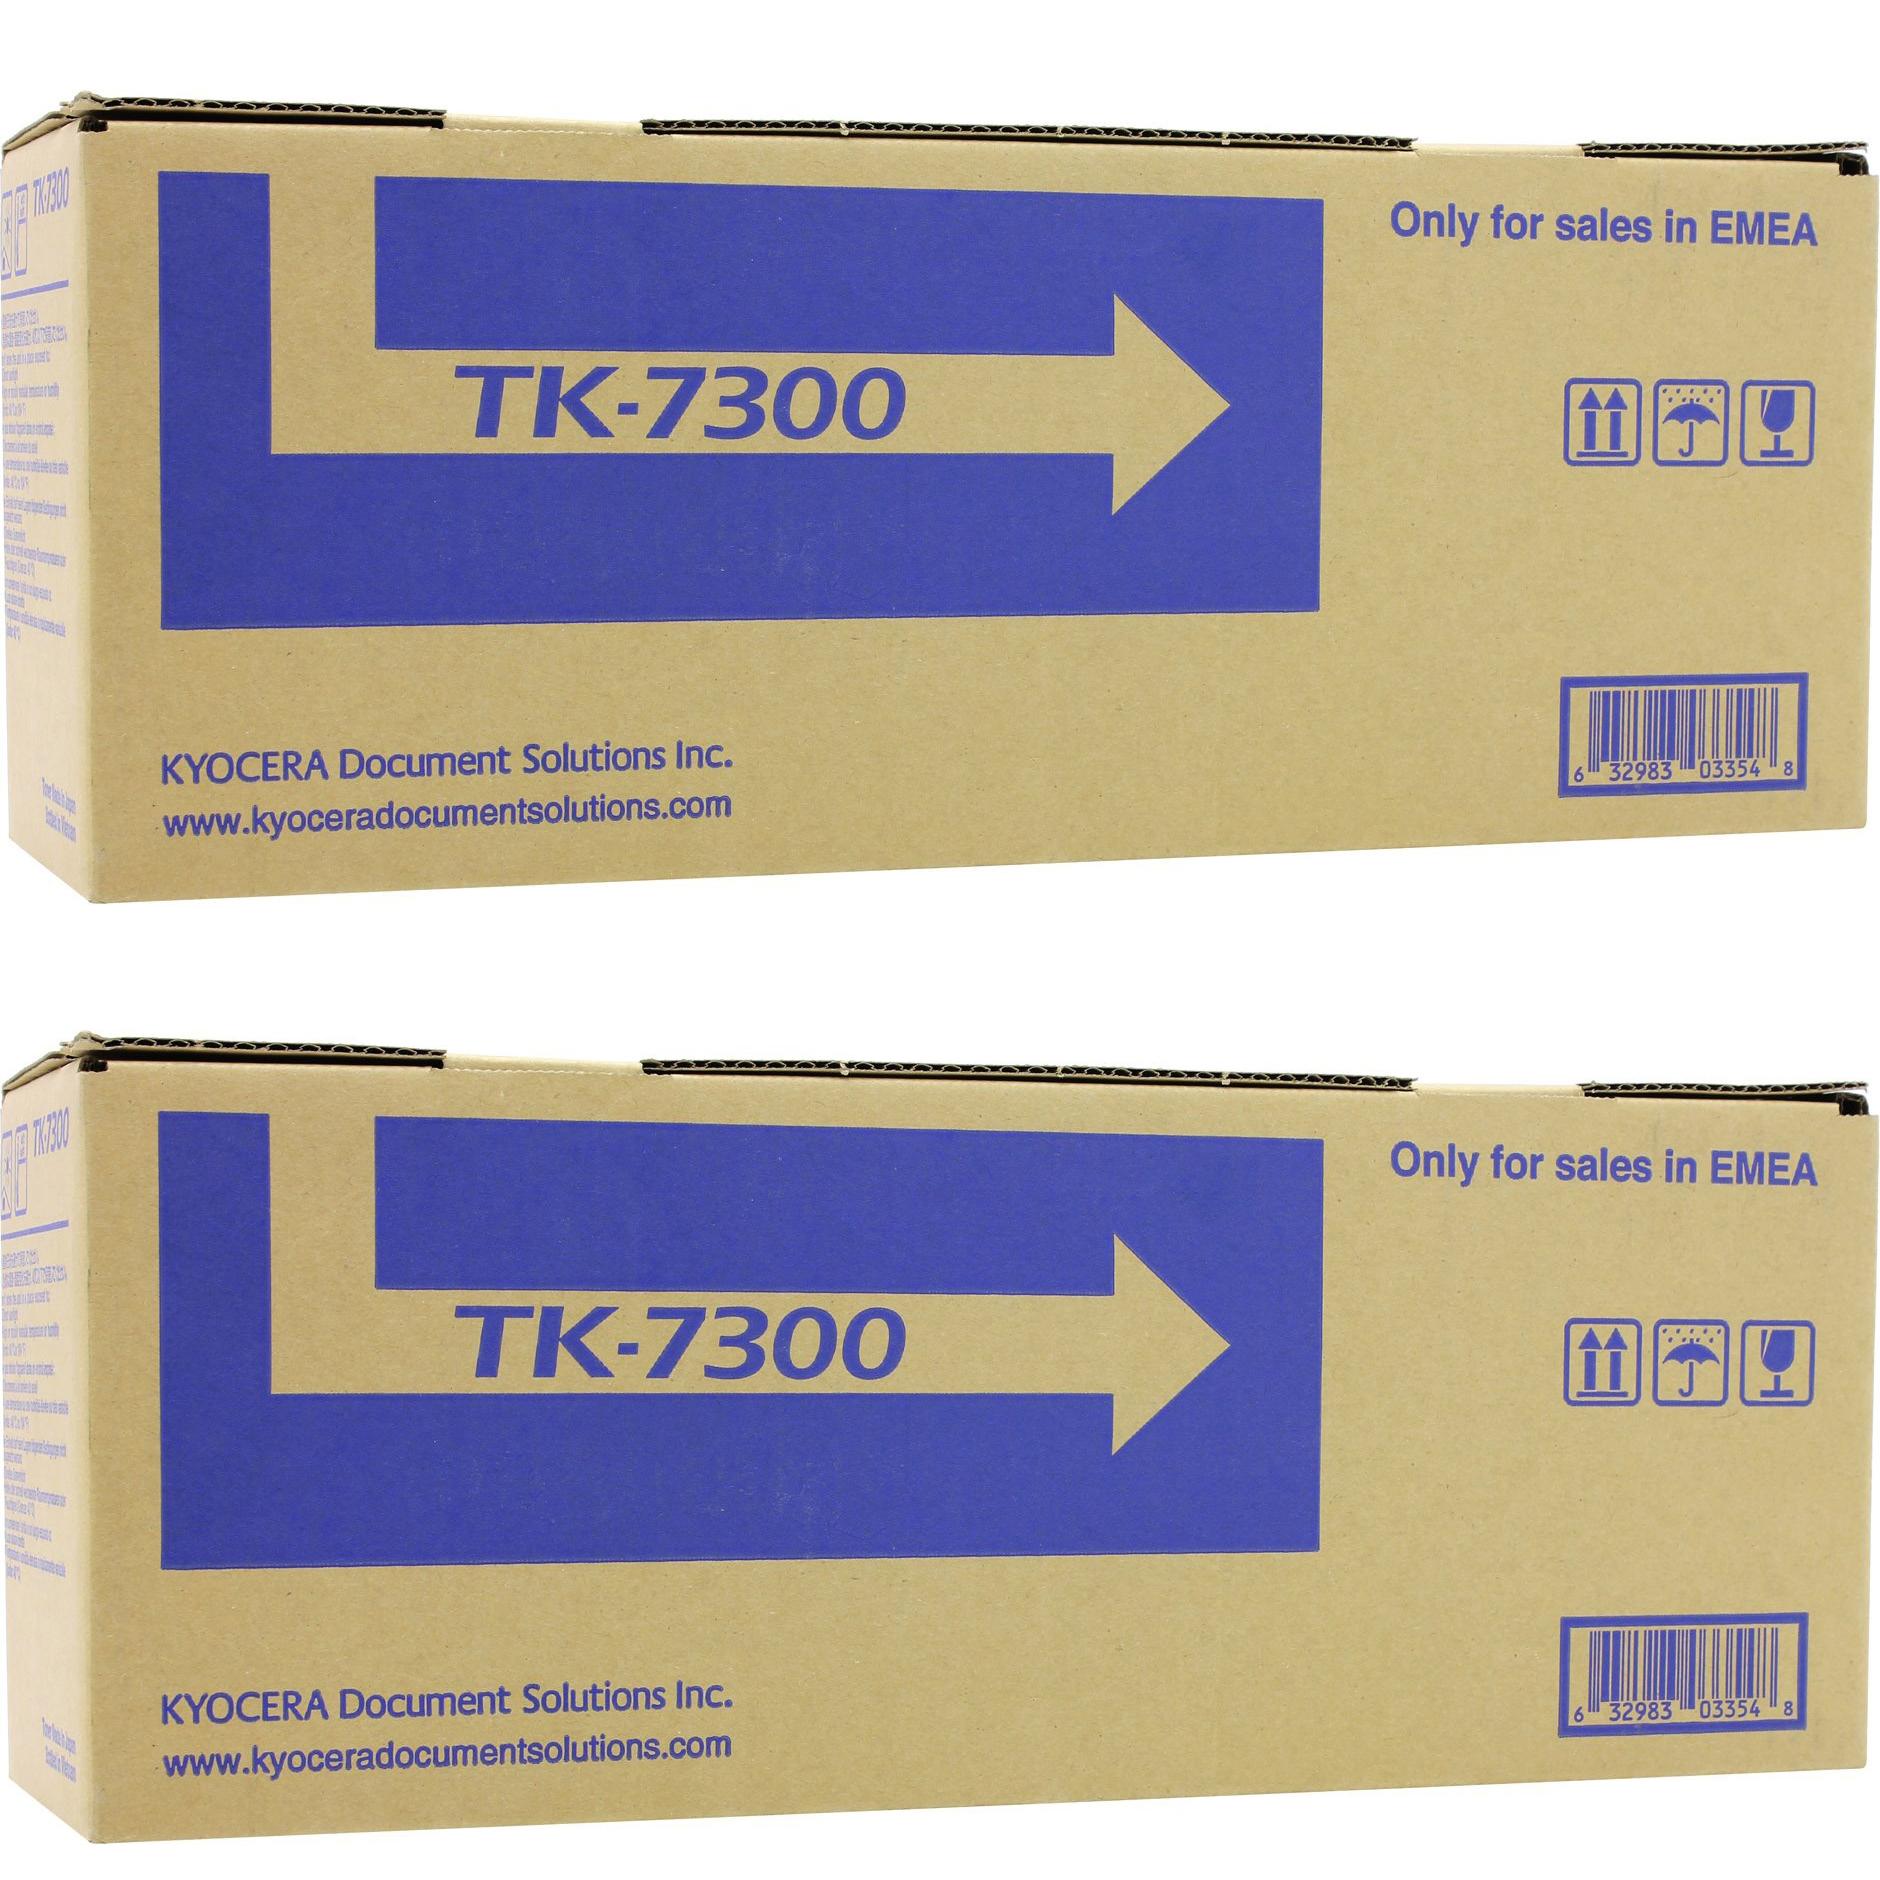 Original Kyocera 1T02P70NL0 Black Twin Pack Toner Cartridges (TK-7300)